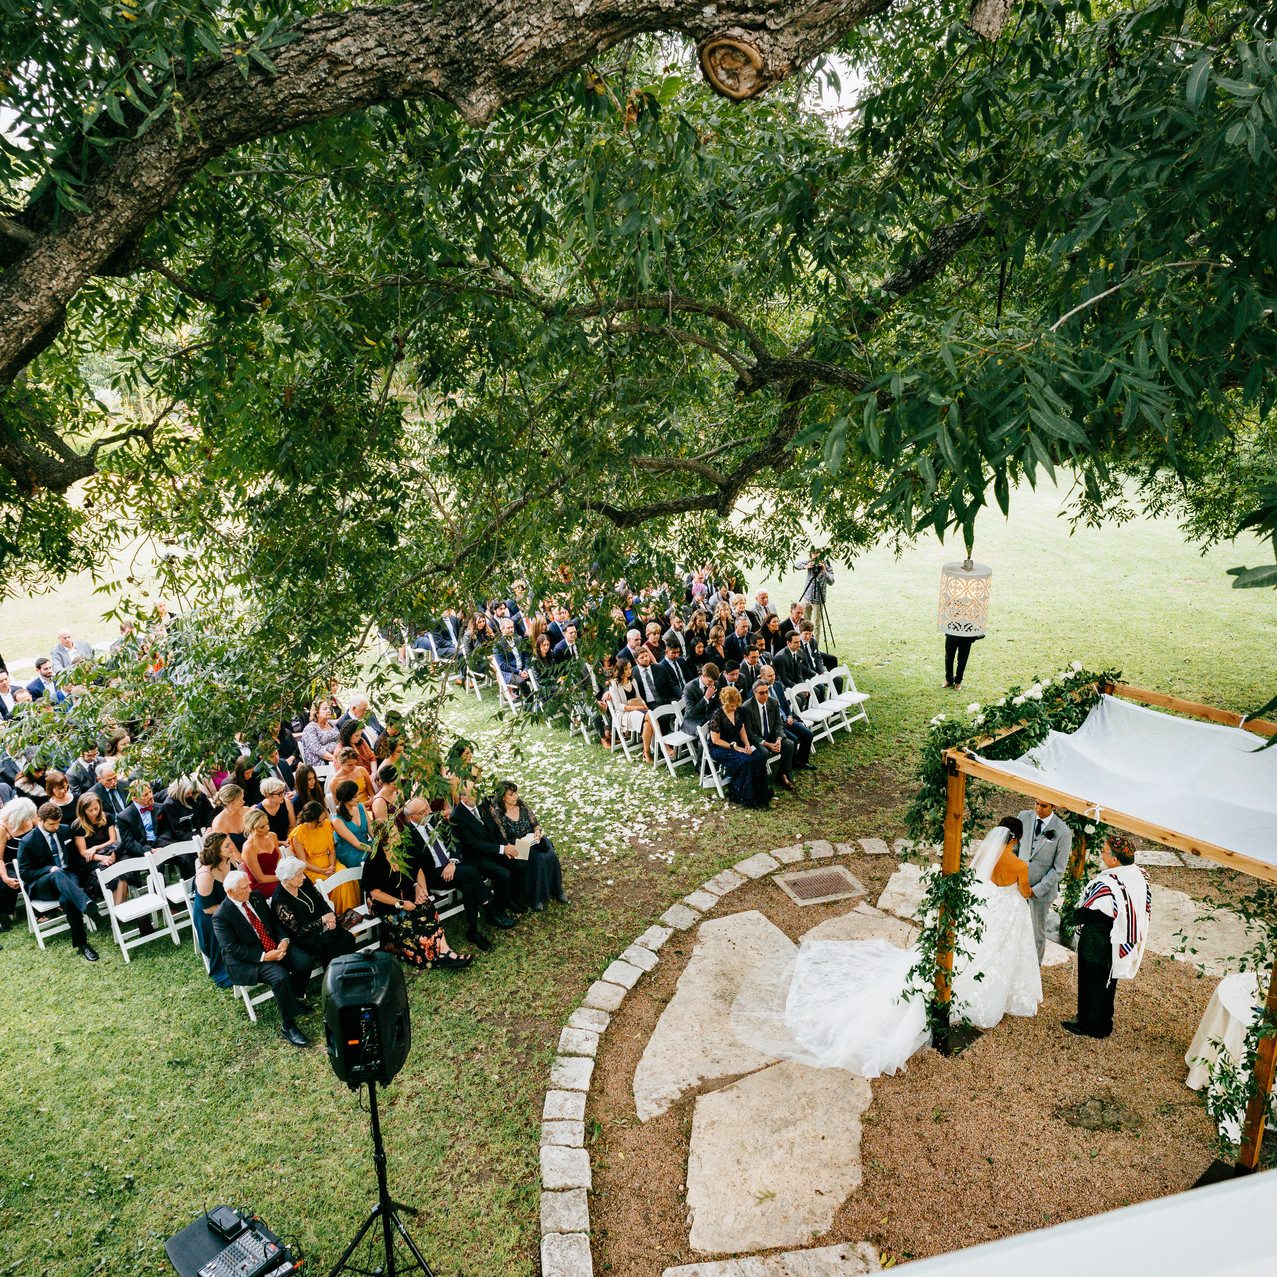 37-Ozer-Gati Wedding-Barr Mansion Jewish